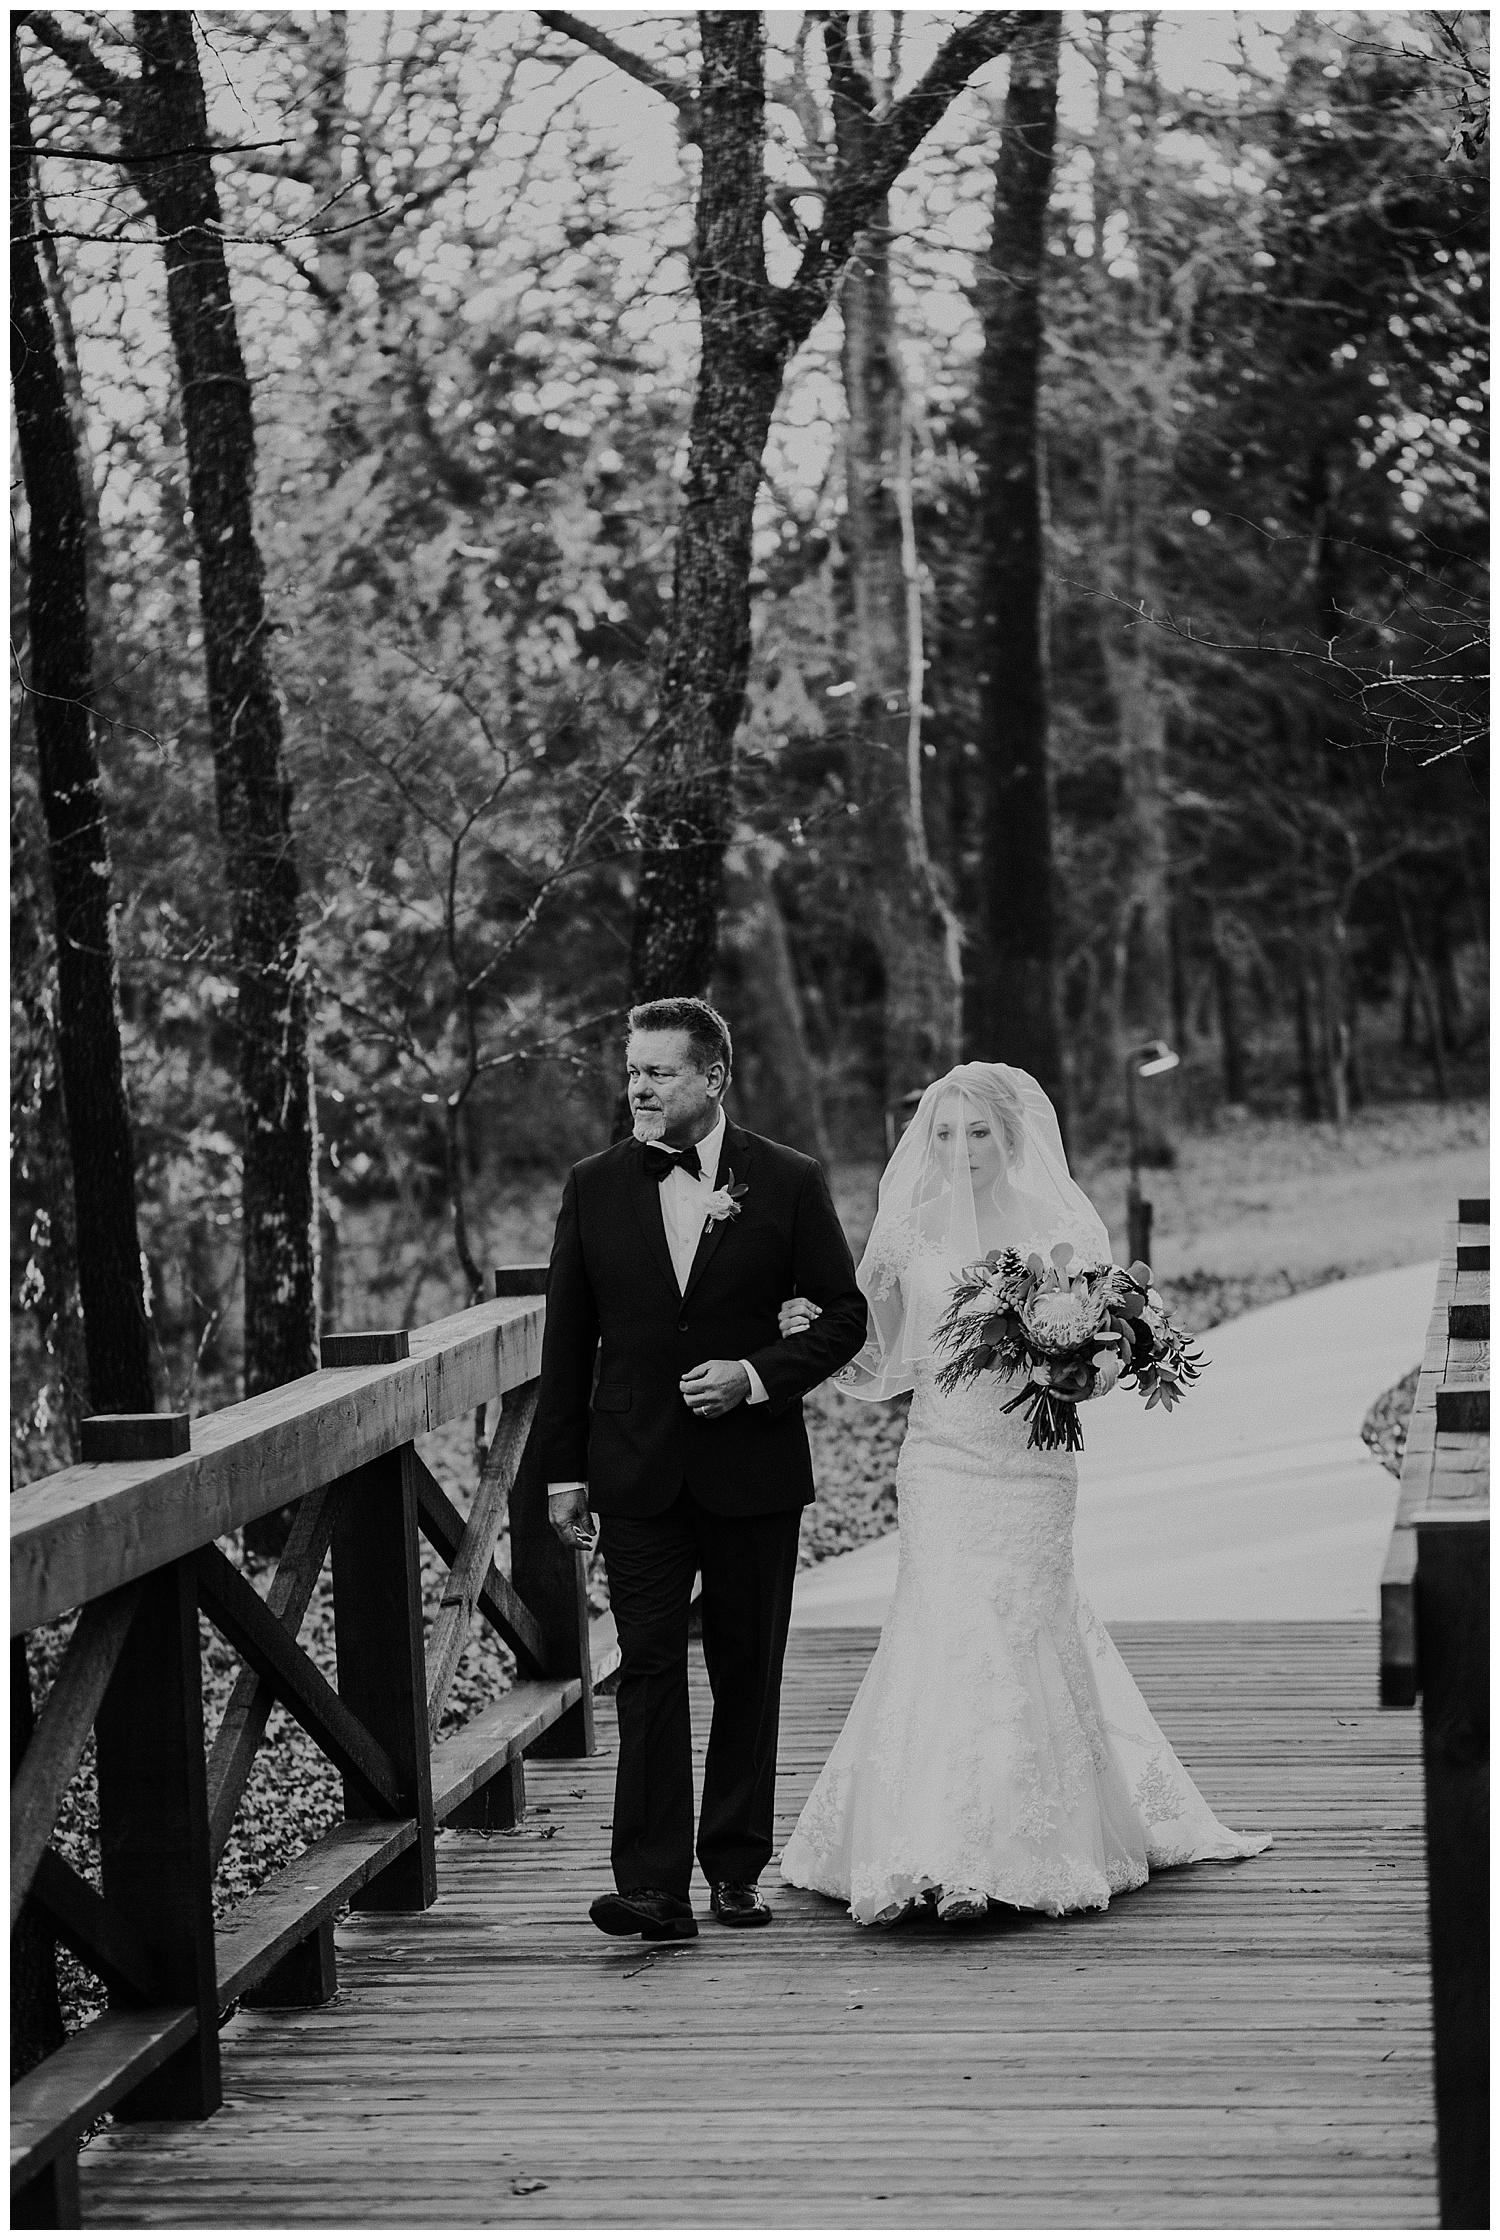 Laken-Mackenzie-Photography-Palm-Whispering-Oaks-Wedding-Venue-Dallas-Wedding-Photographer14.jpg